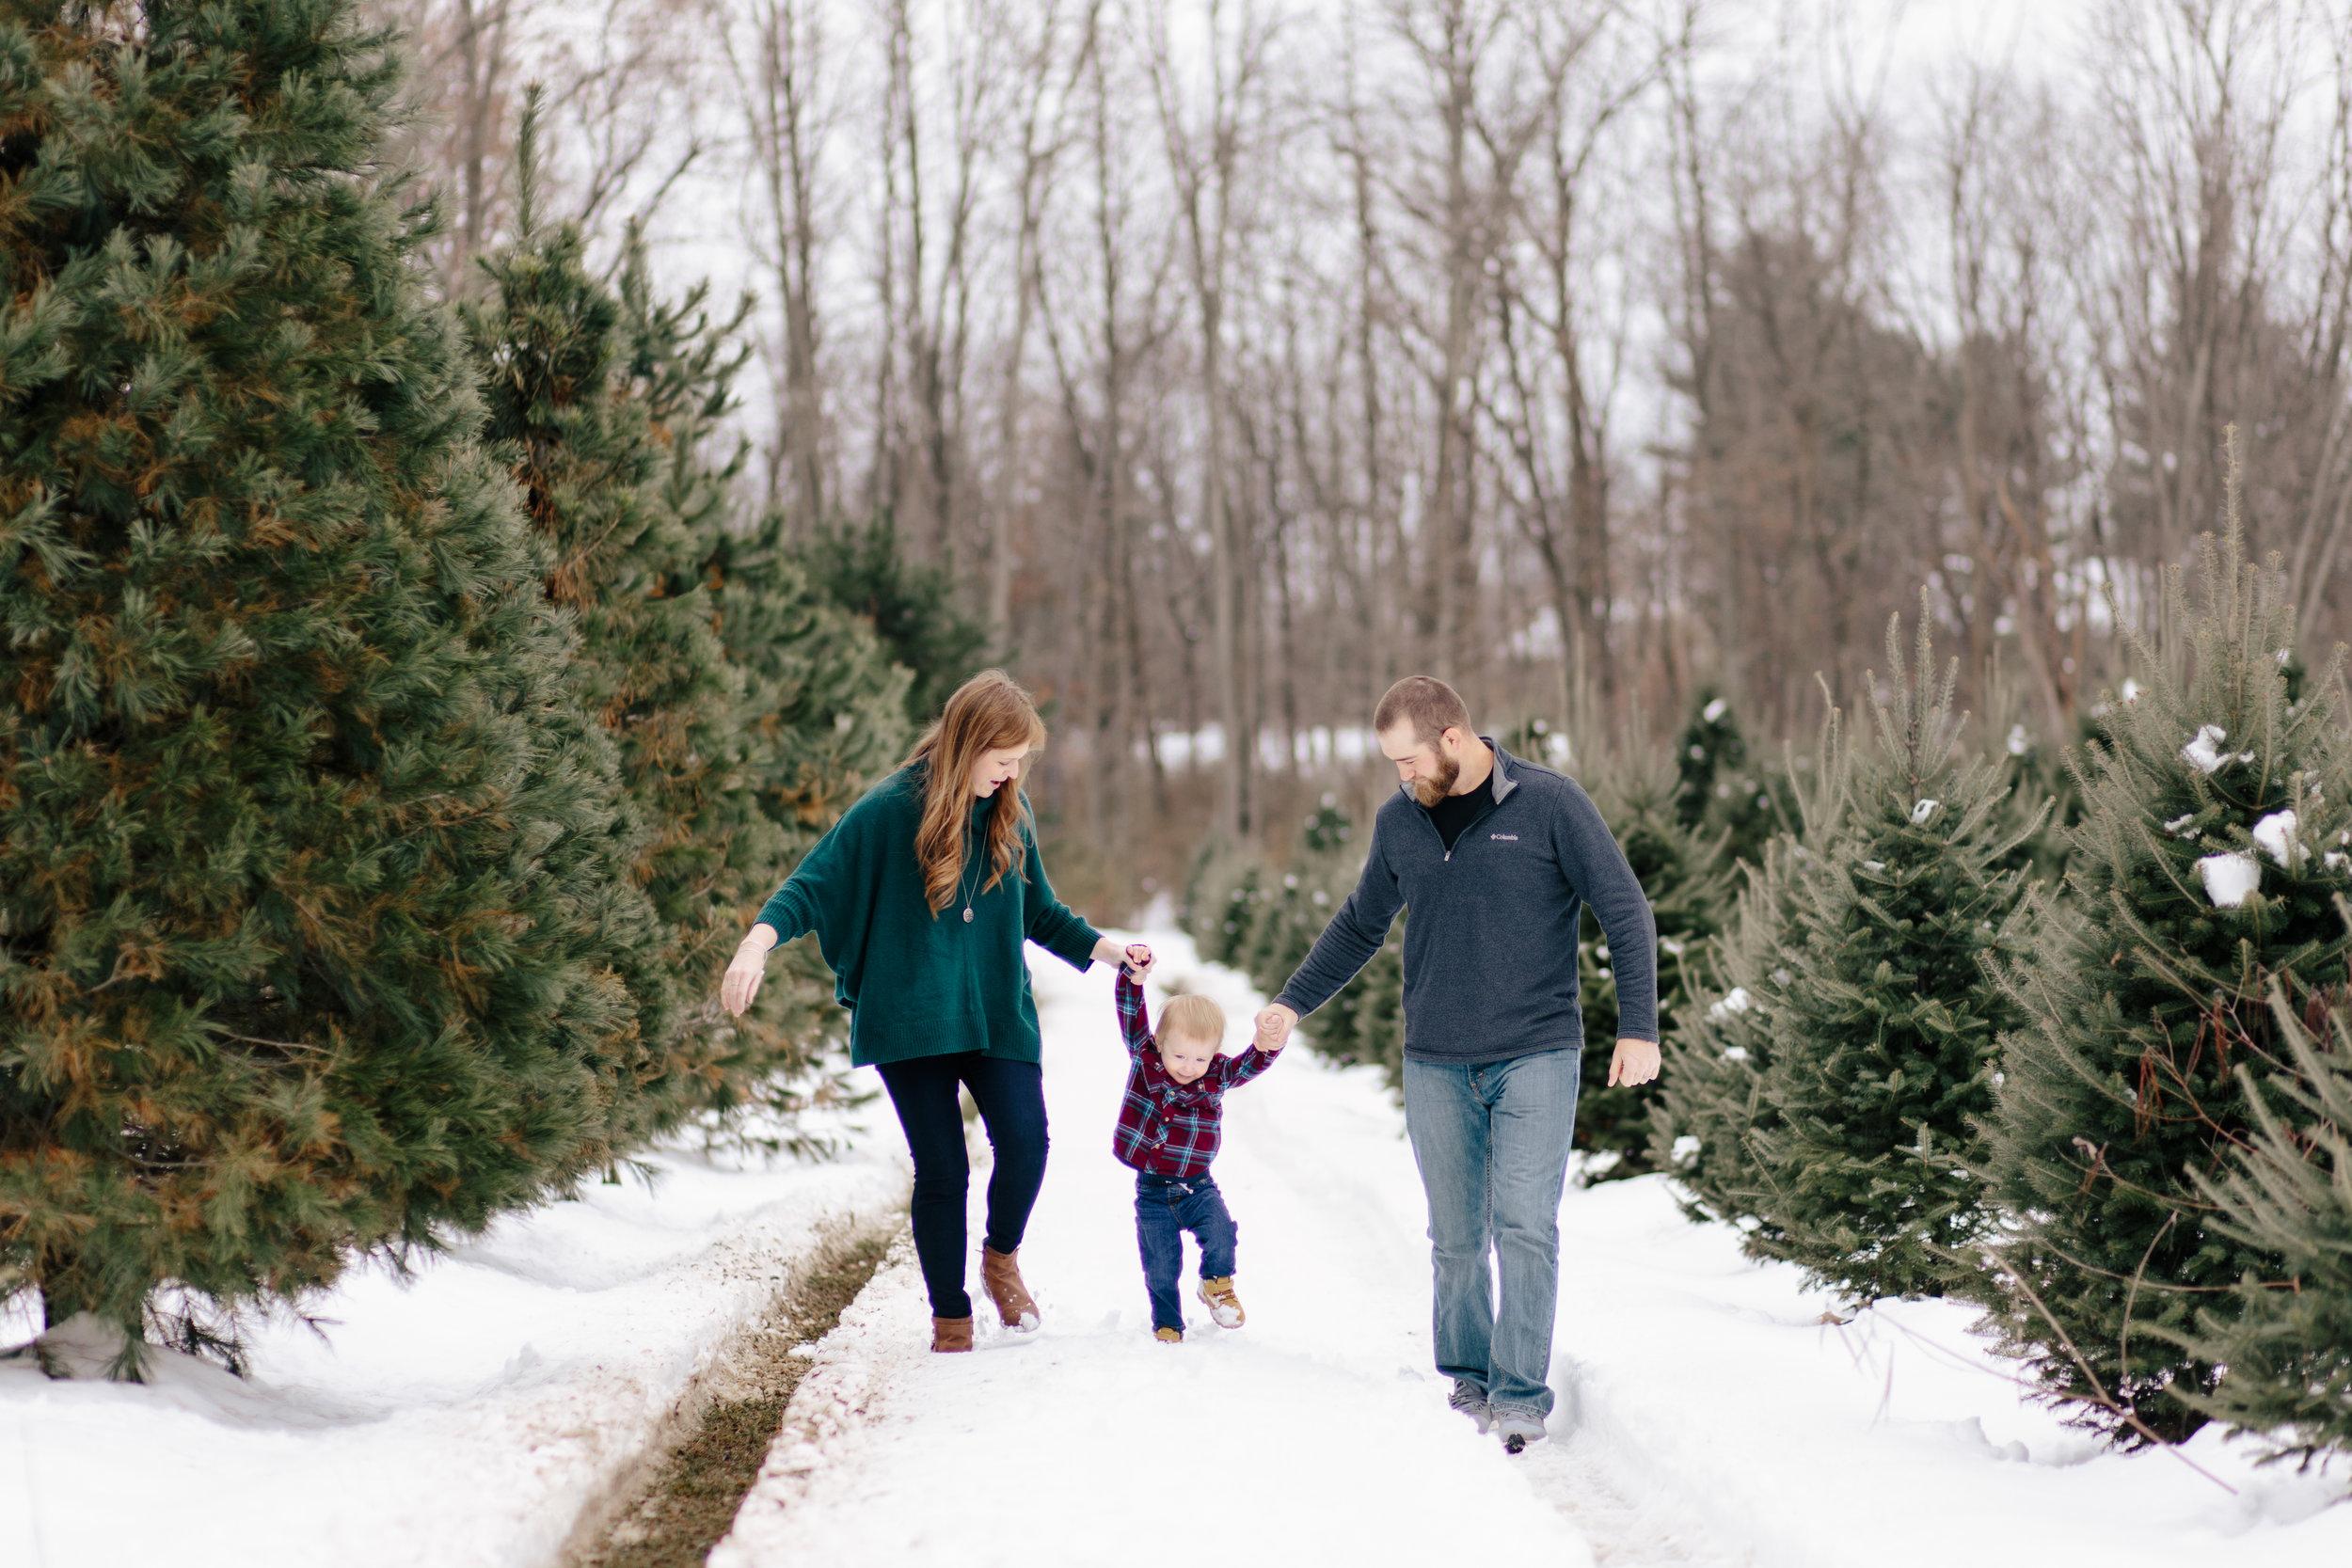 saundra_megan_photography_stout_family_christmas-2.jpg